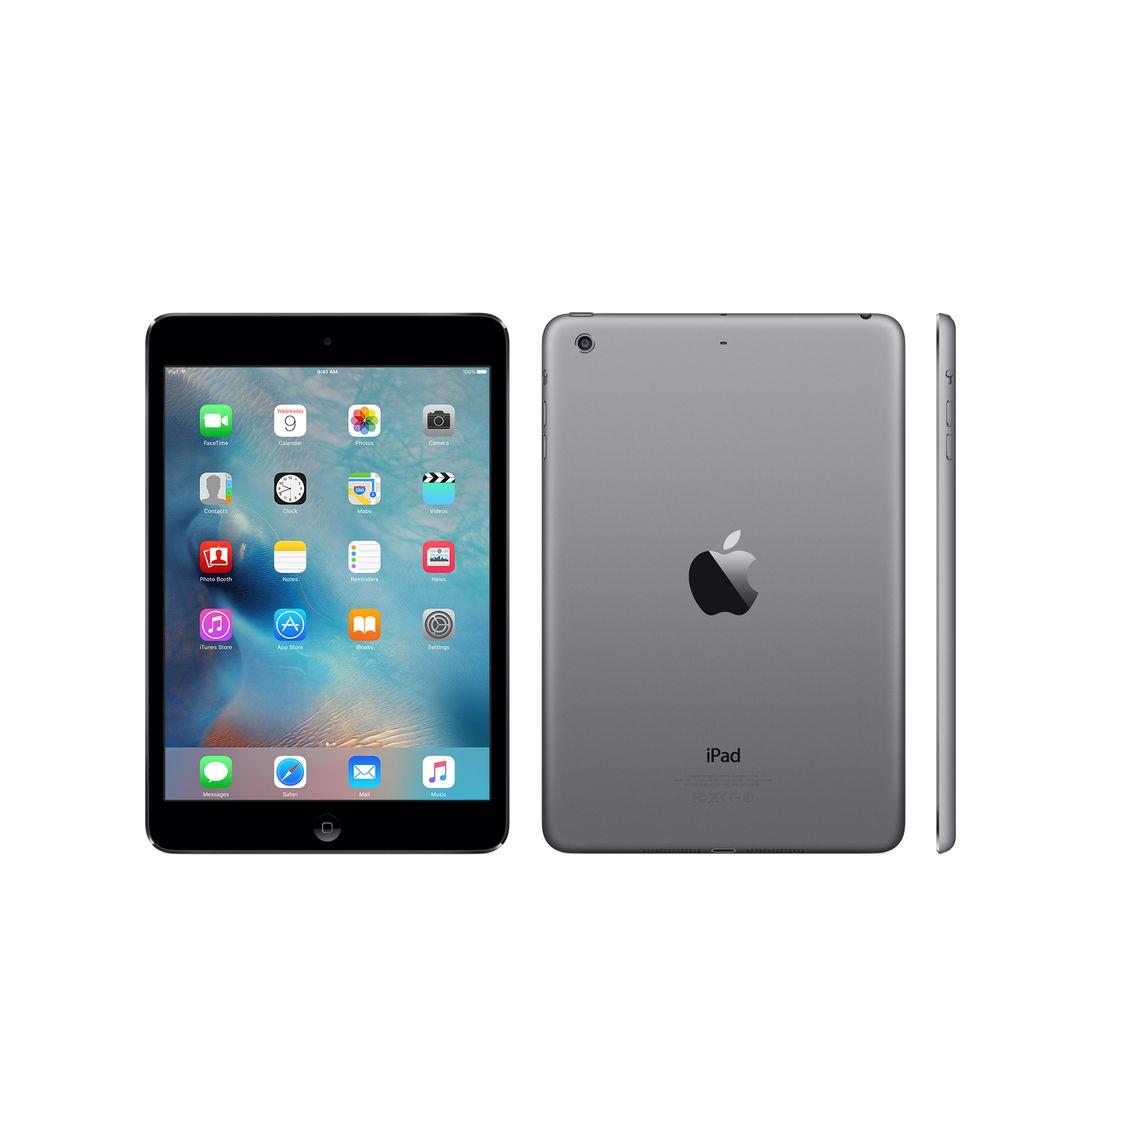 apple ipad mini 2 32gb manual